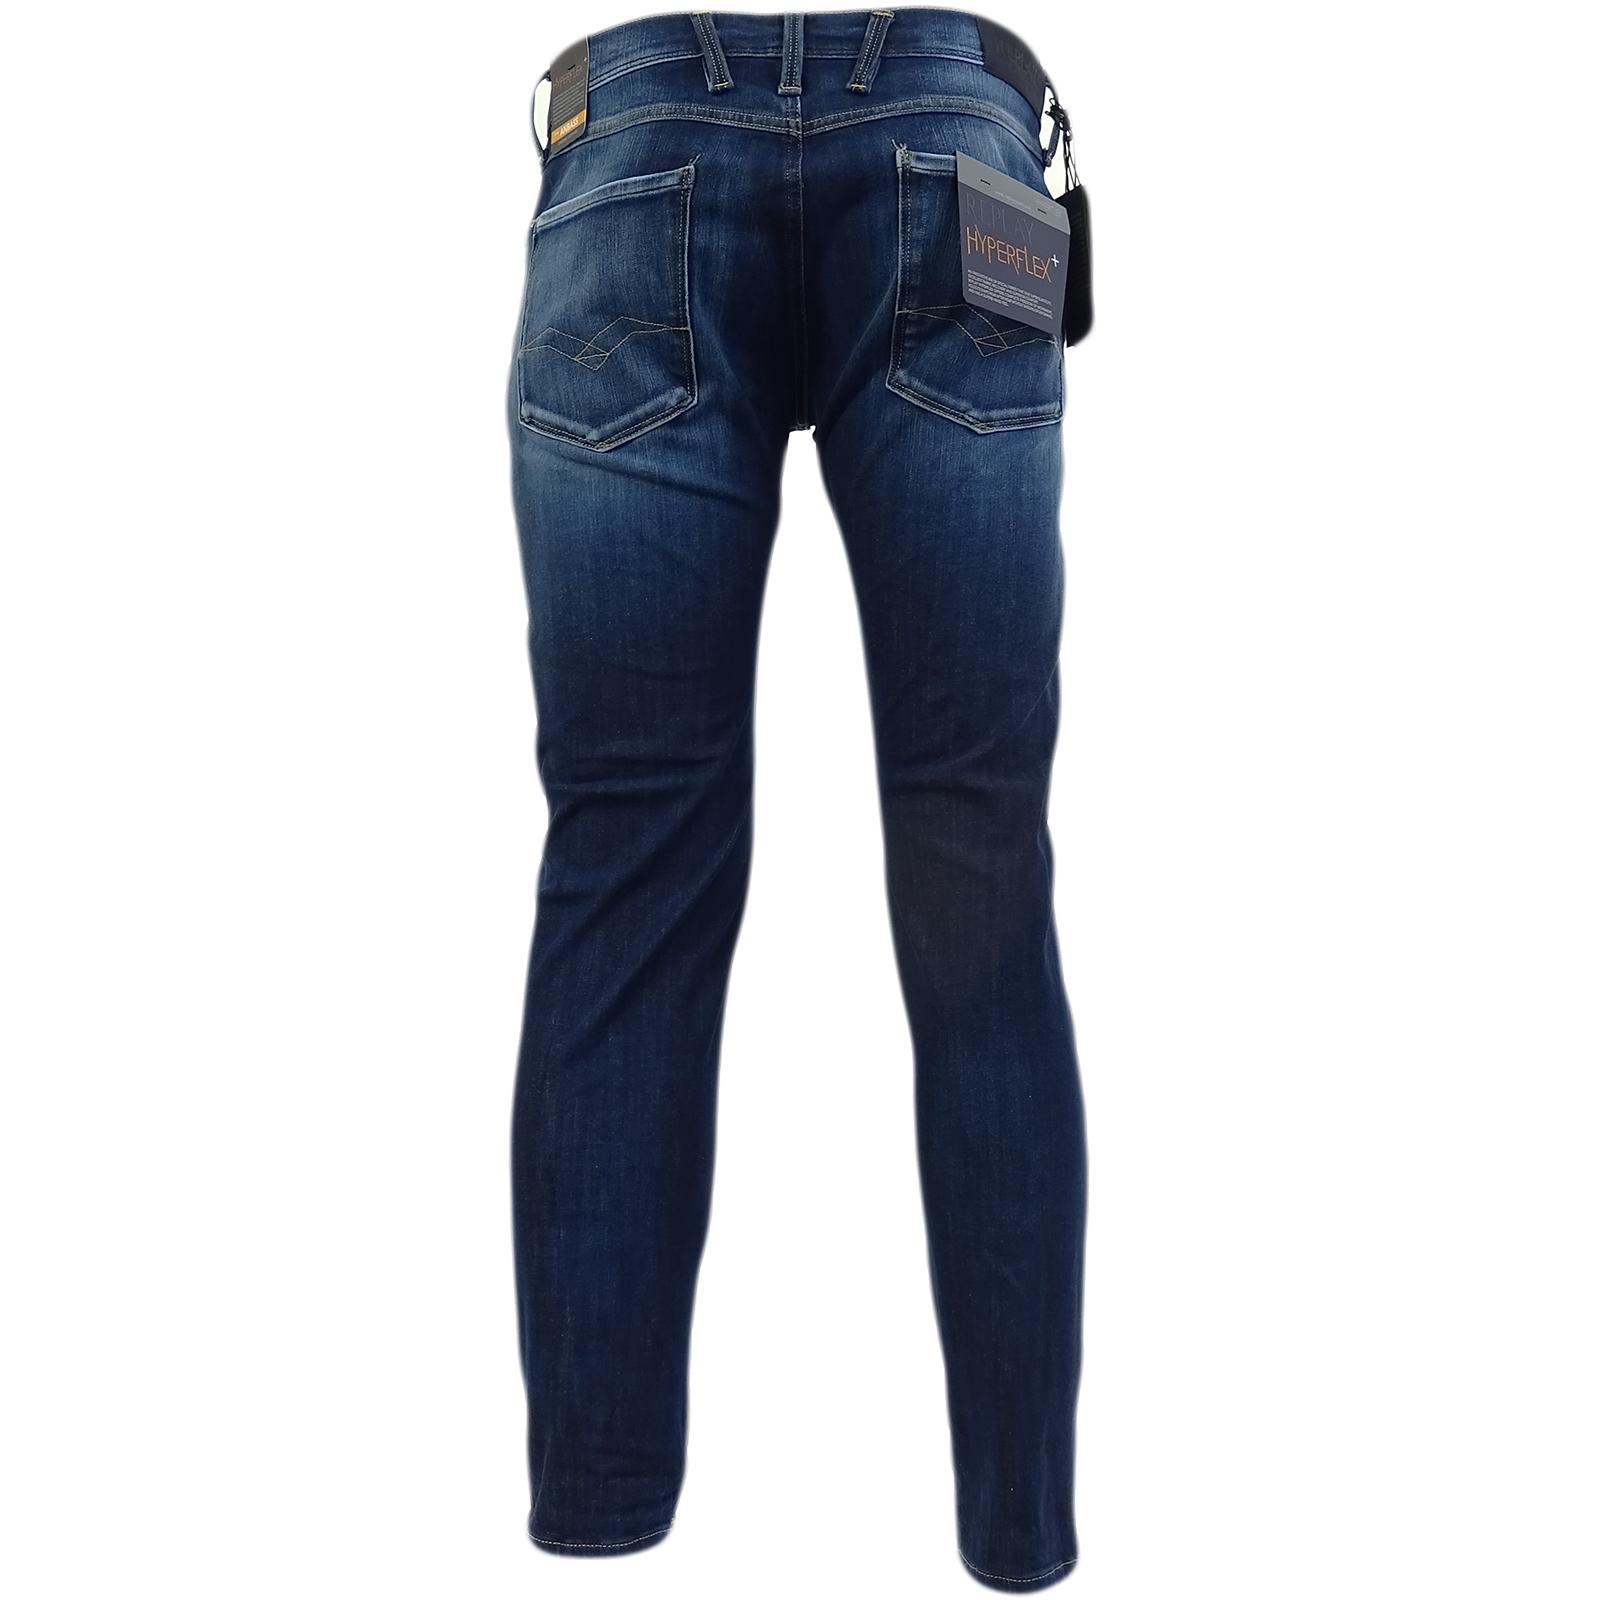 Replay Dark Blue Hyperflex Stretch Slim Fit Jean M914-661-S14-007